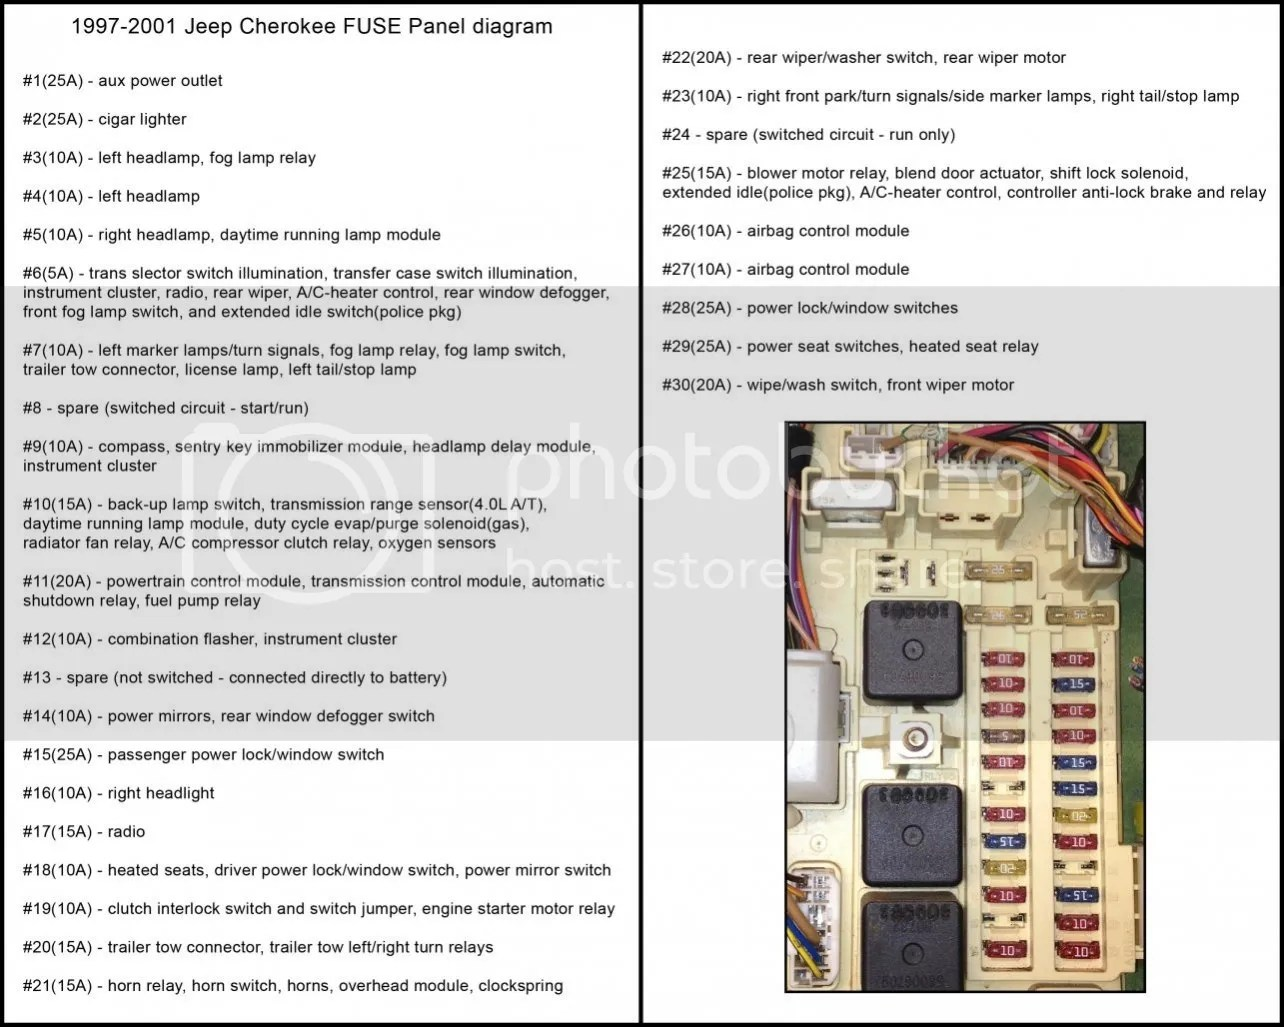 1999 jeep cherokee xj wiring diagram starting know about wiring jeep  cherokee fuse box diagram 1999